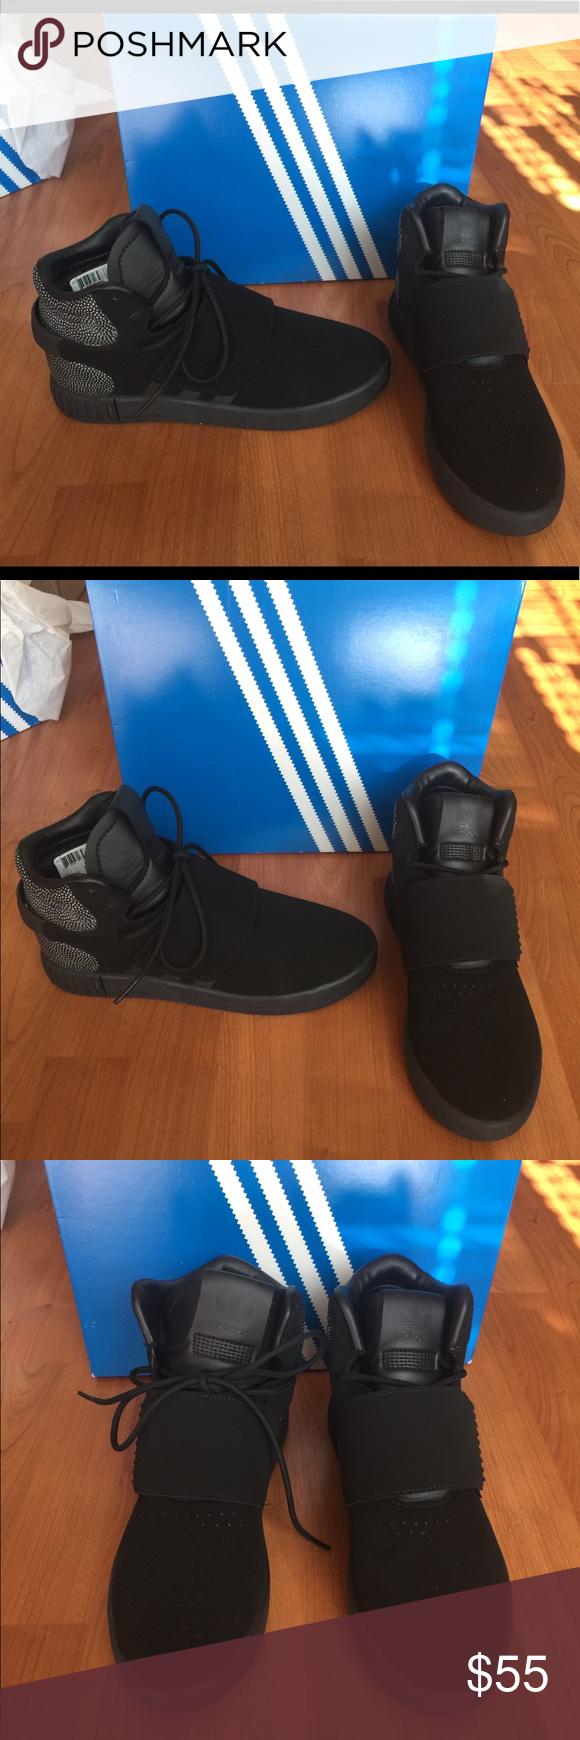 Nuevo adidas tubular invasor Correa Ray negro zapatilla High Top adidas